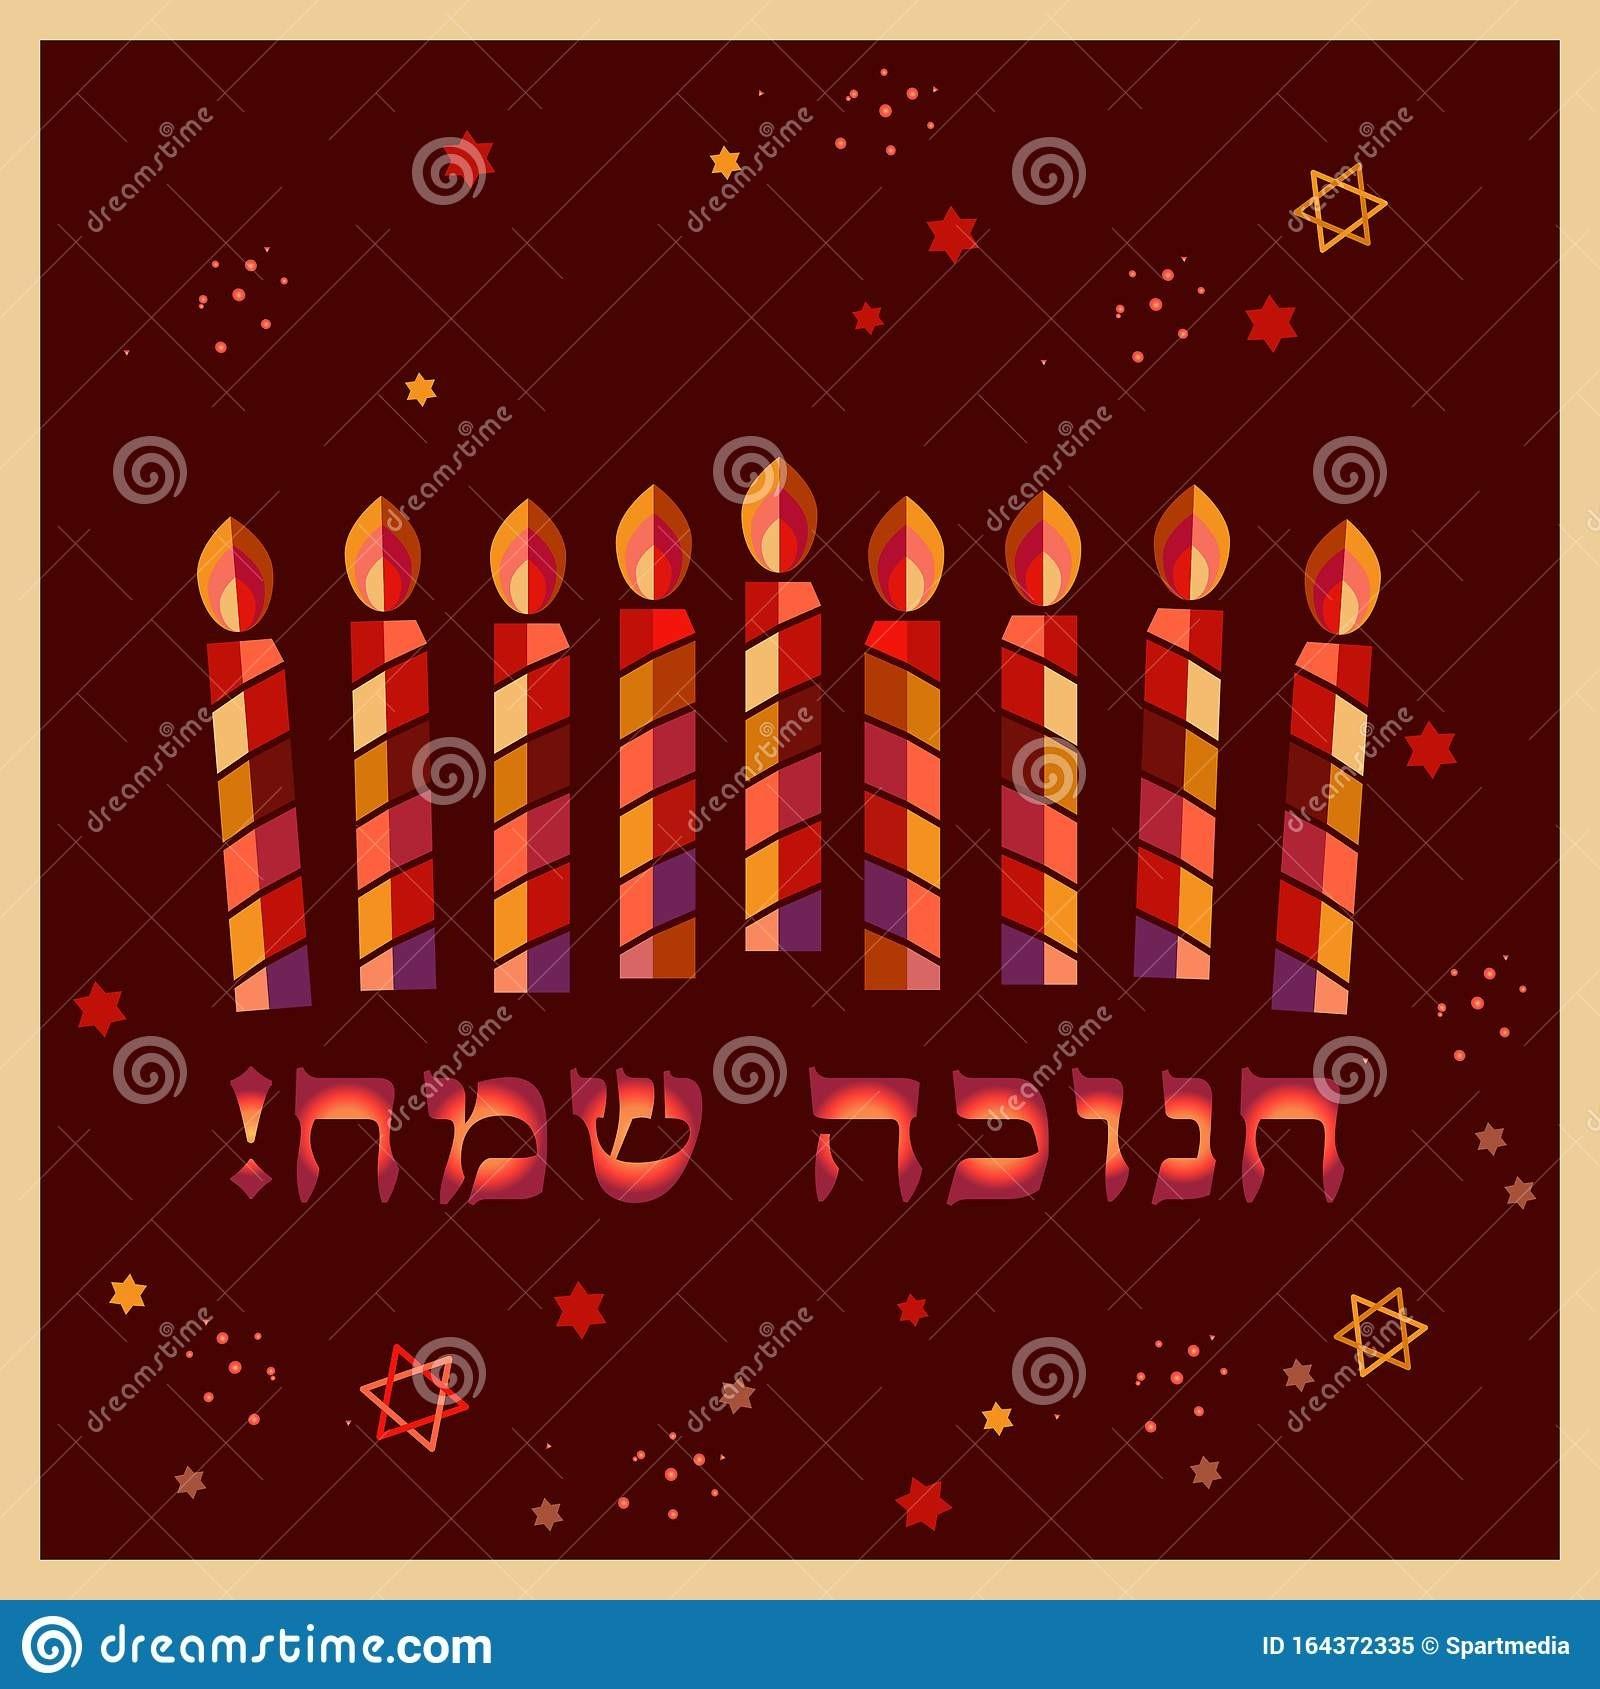 Happy Hanukkah 2020 Vintage Decoration Winter Holiday-Free Food Holidays 2020